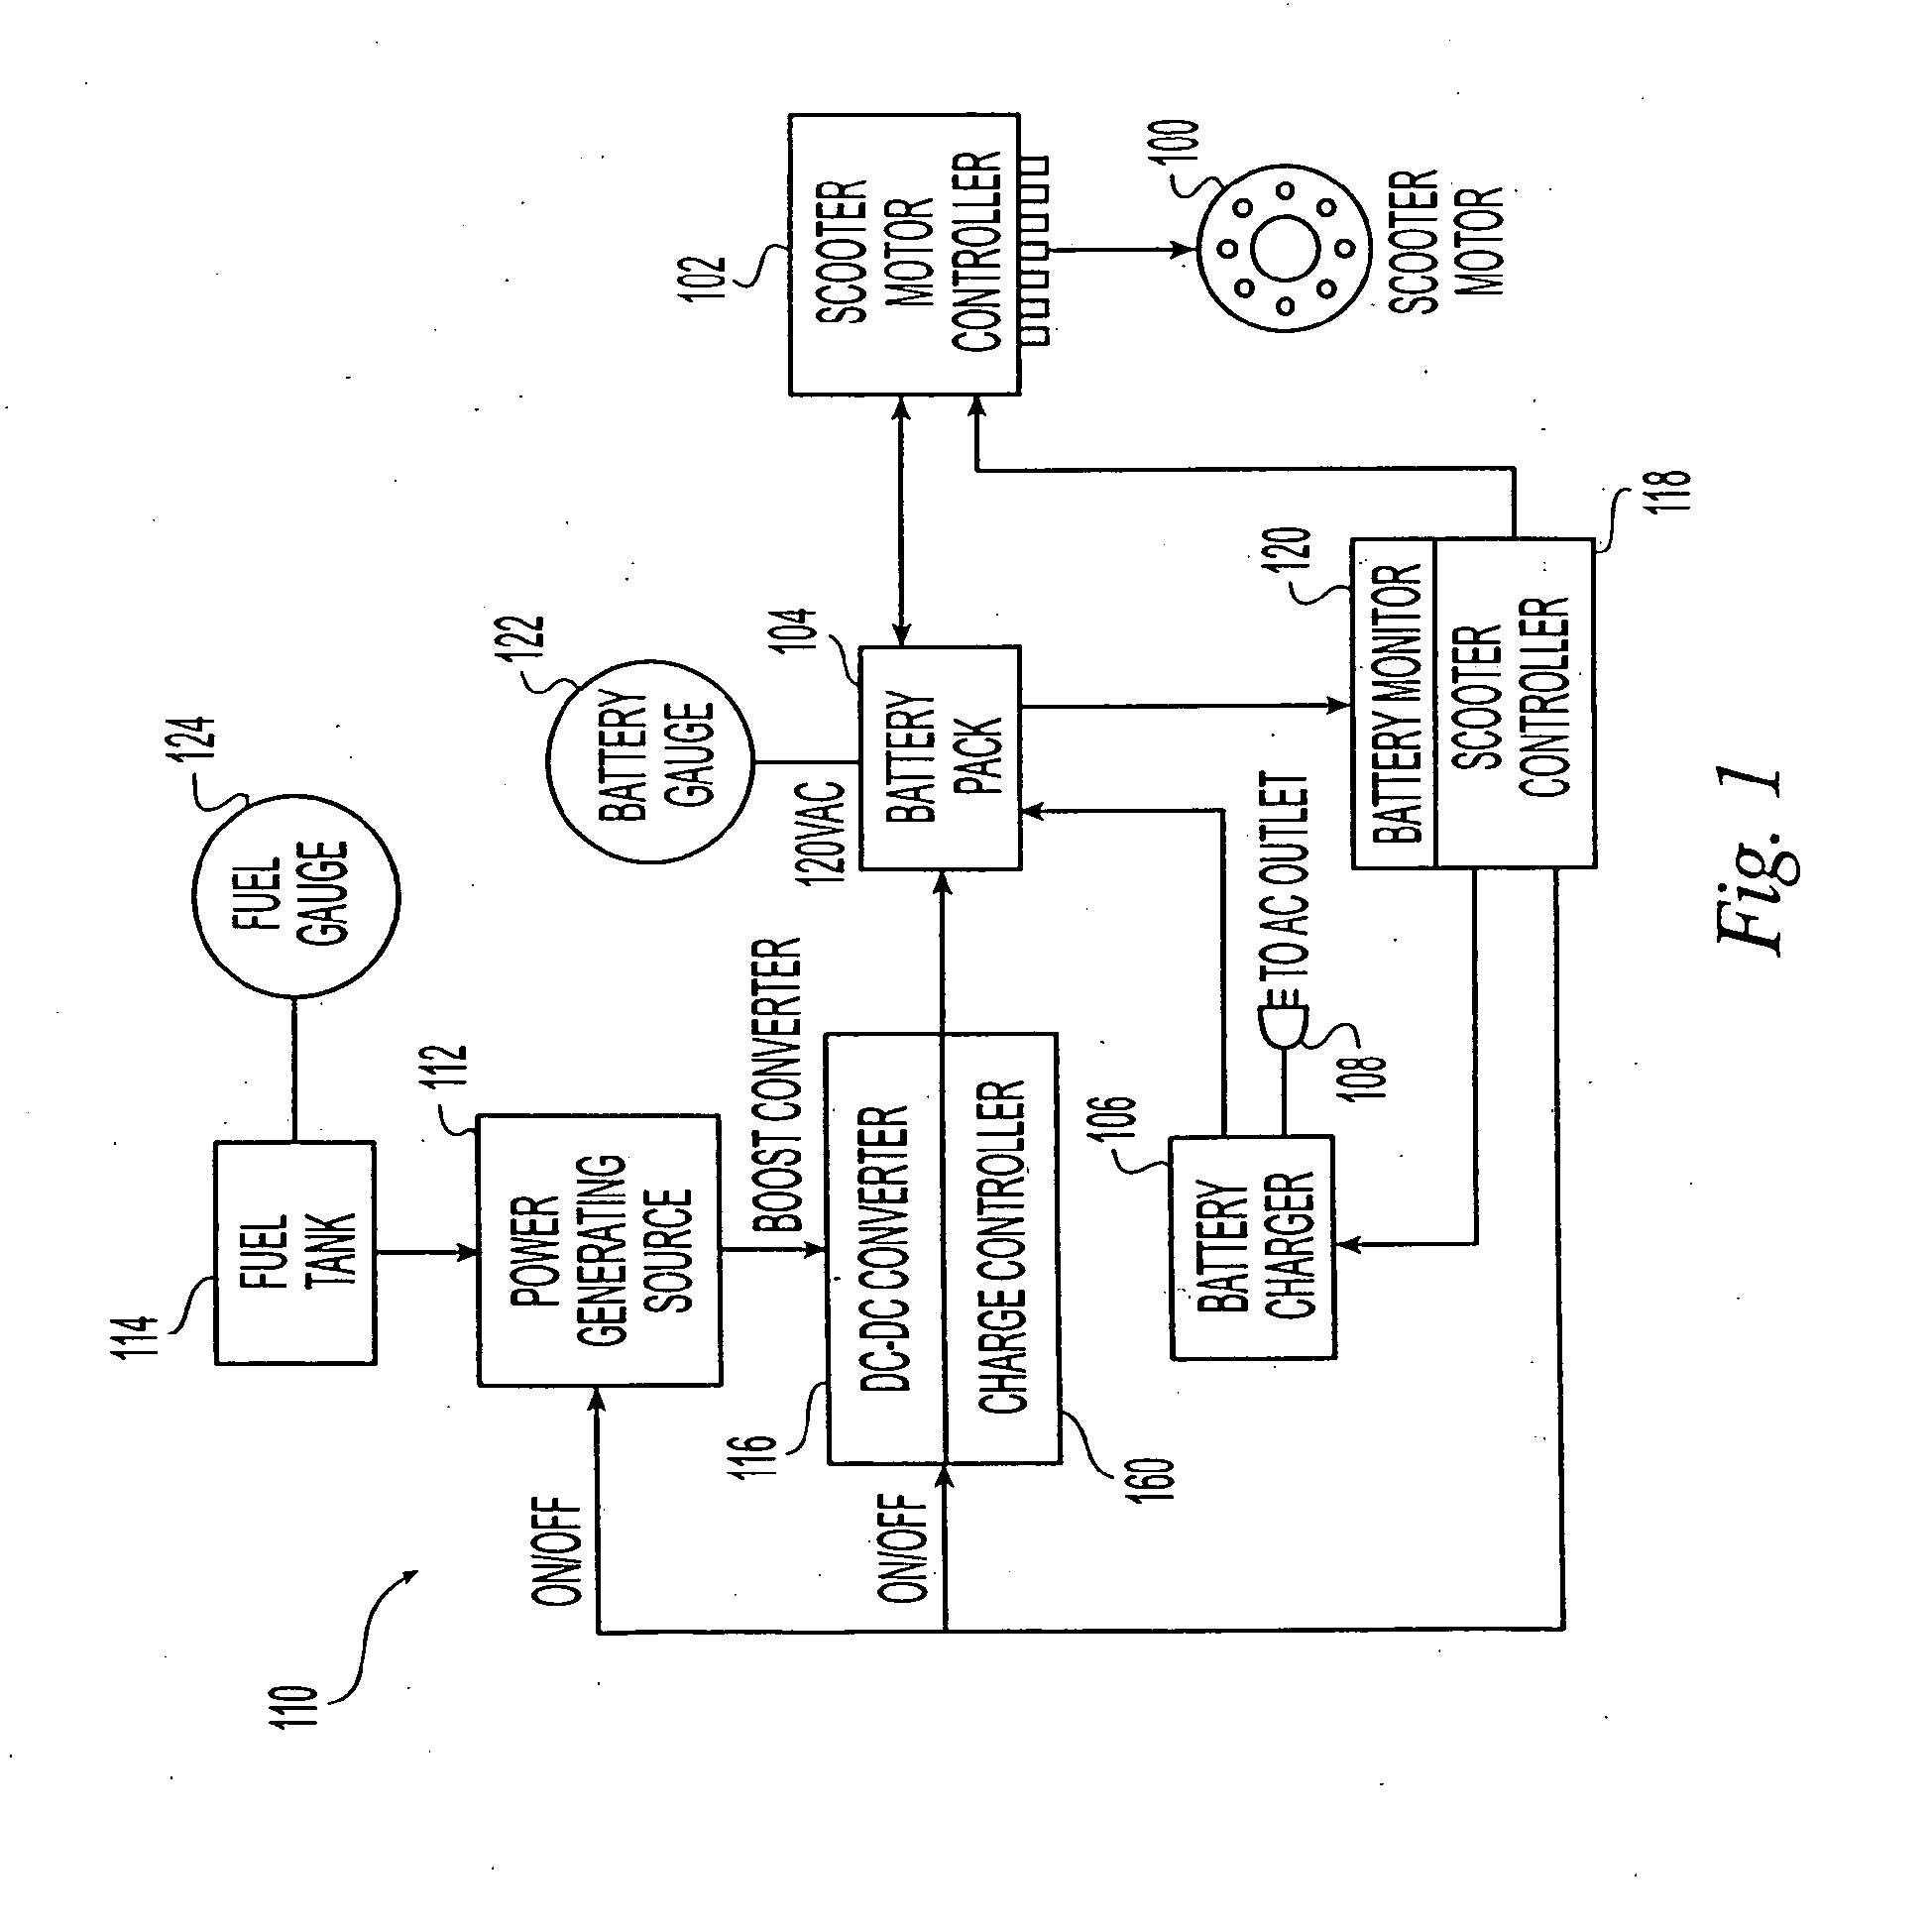 patent ep2301790a2